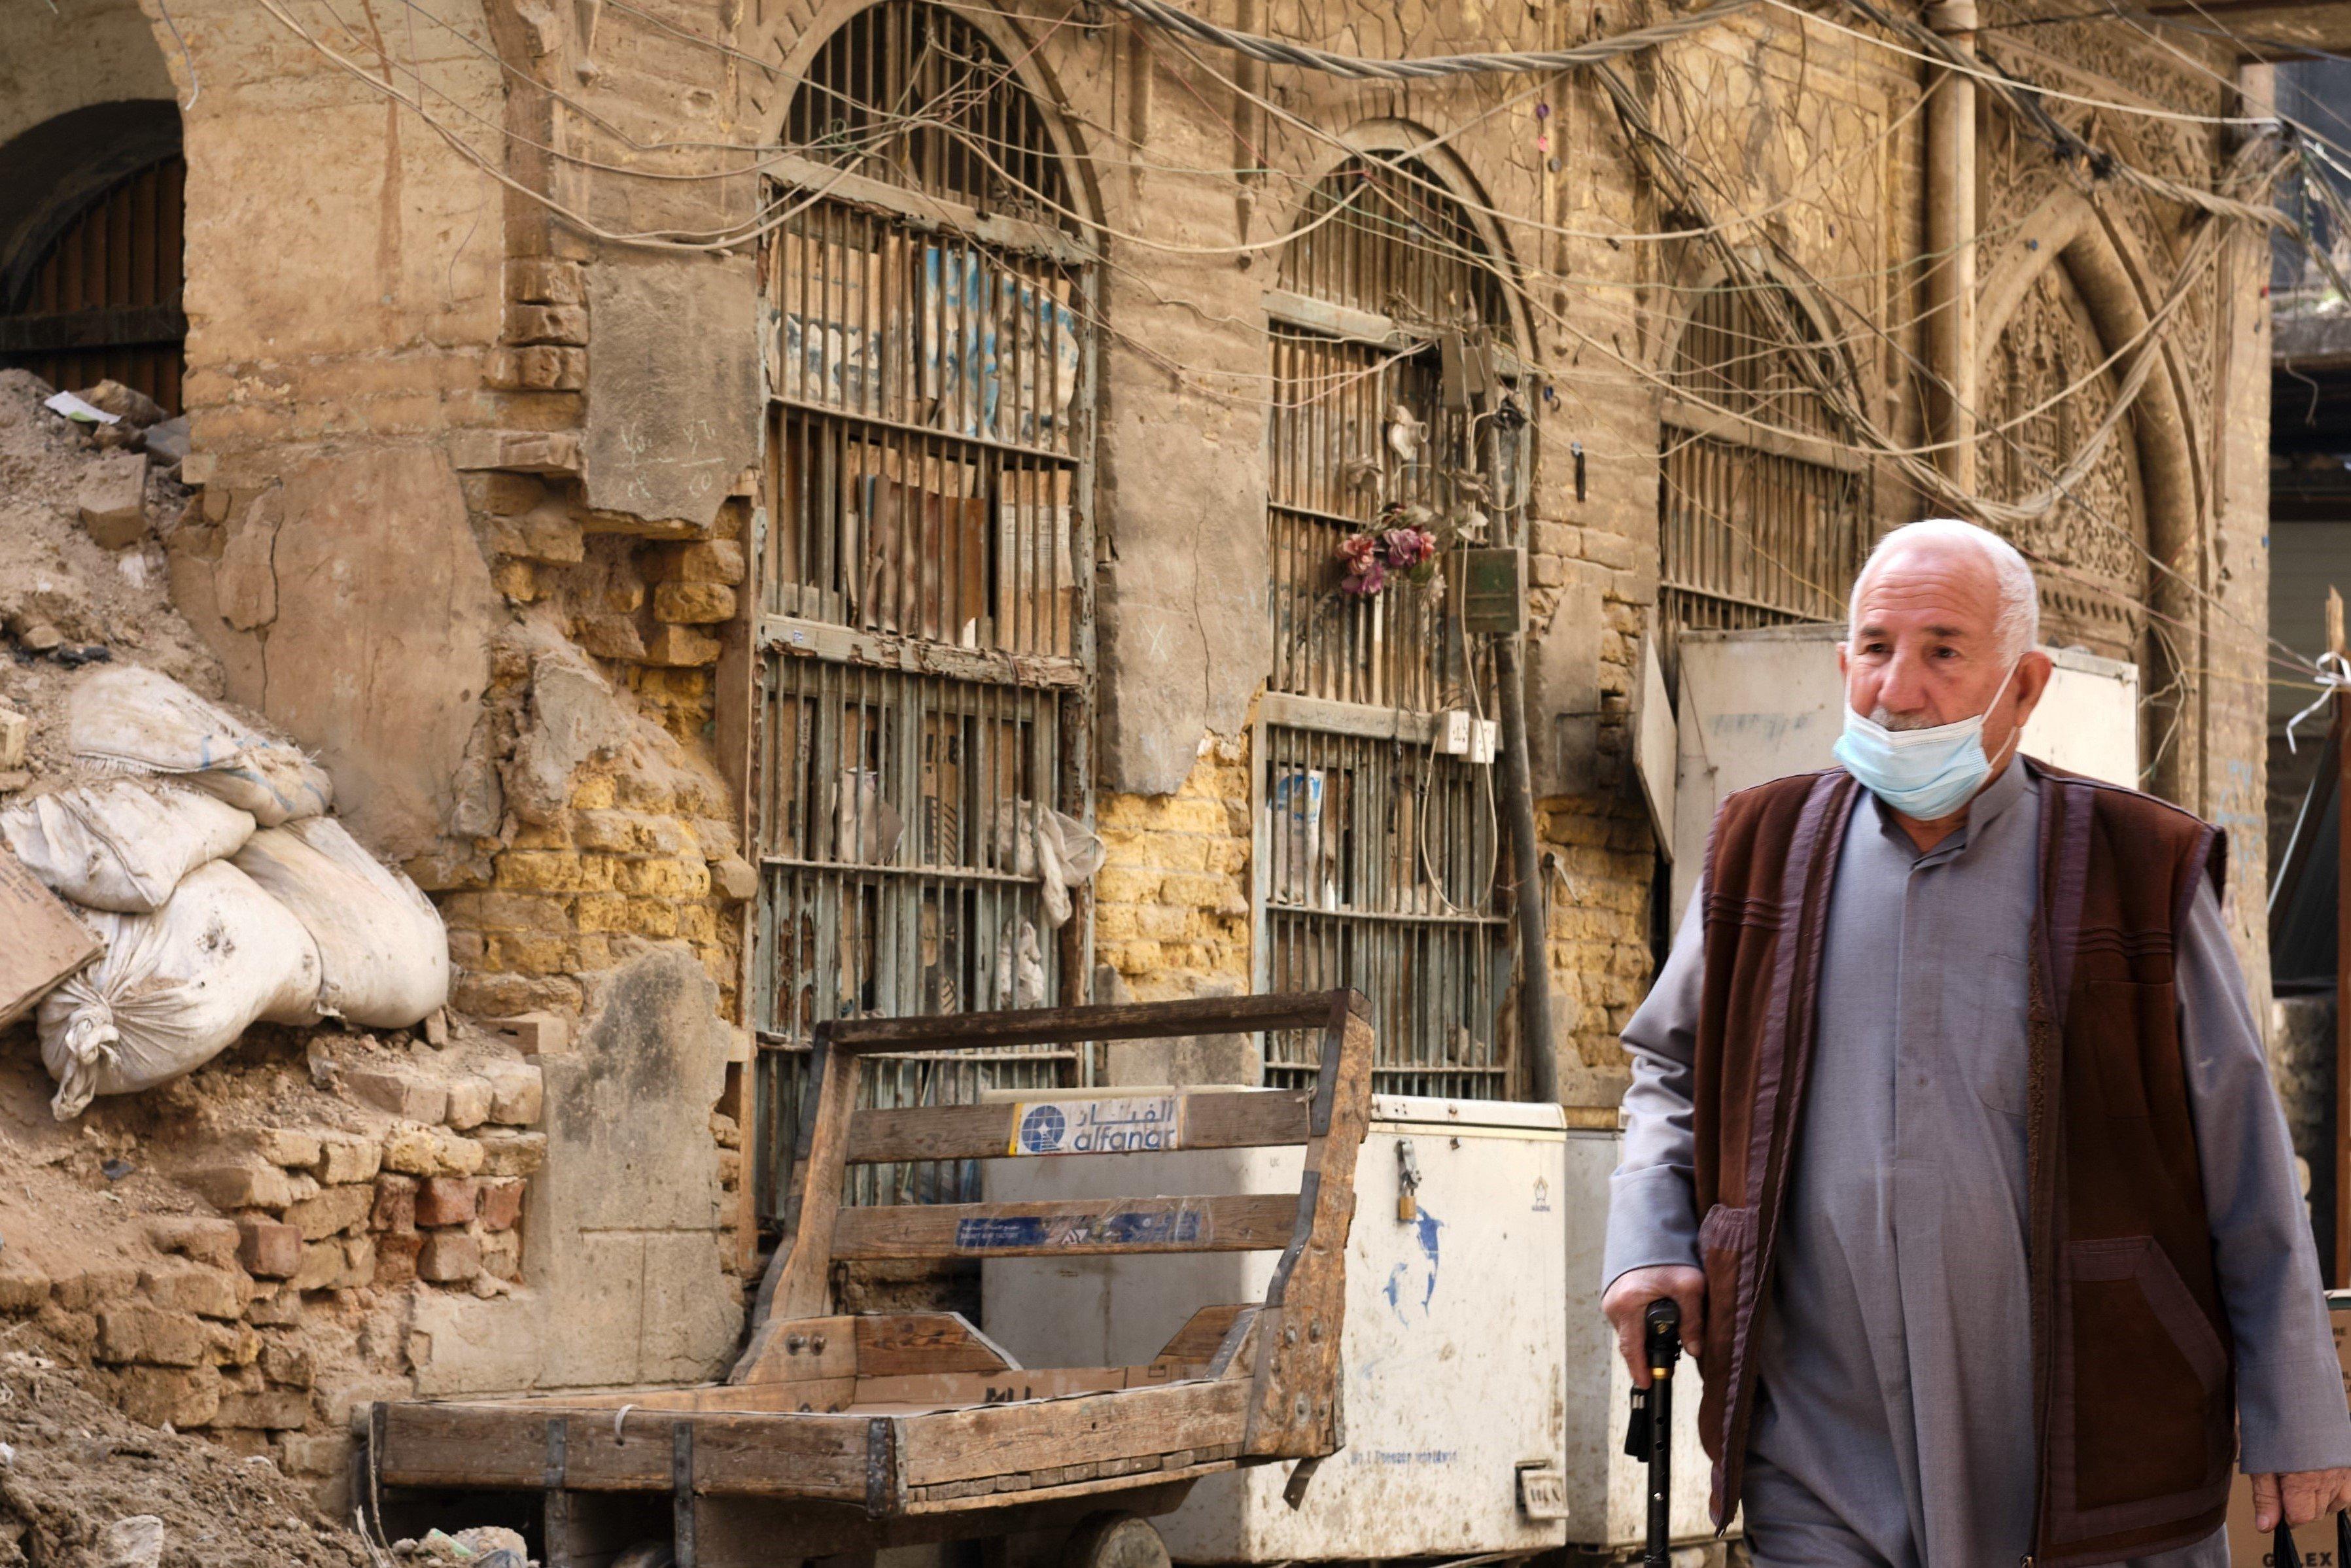 An Iraqi man walks the streets of Baghdad on 25 January, 2021 (Nabil Salih)